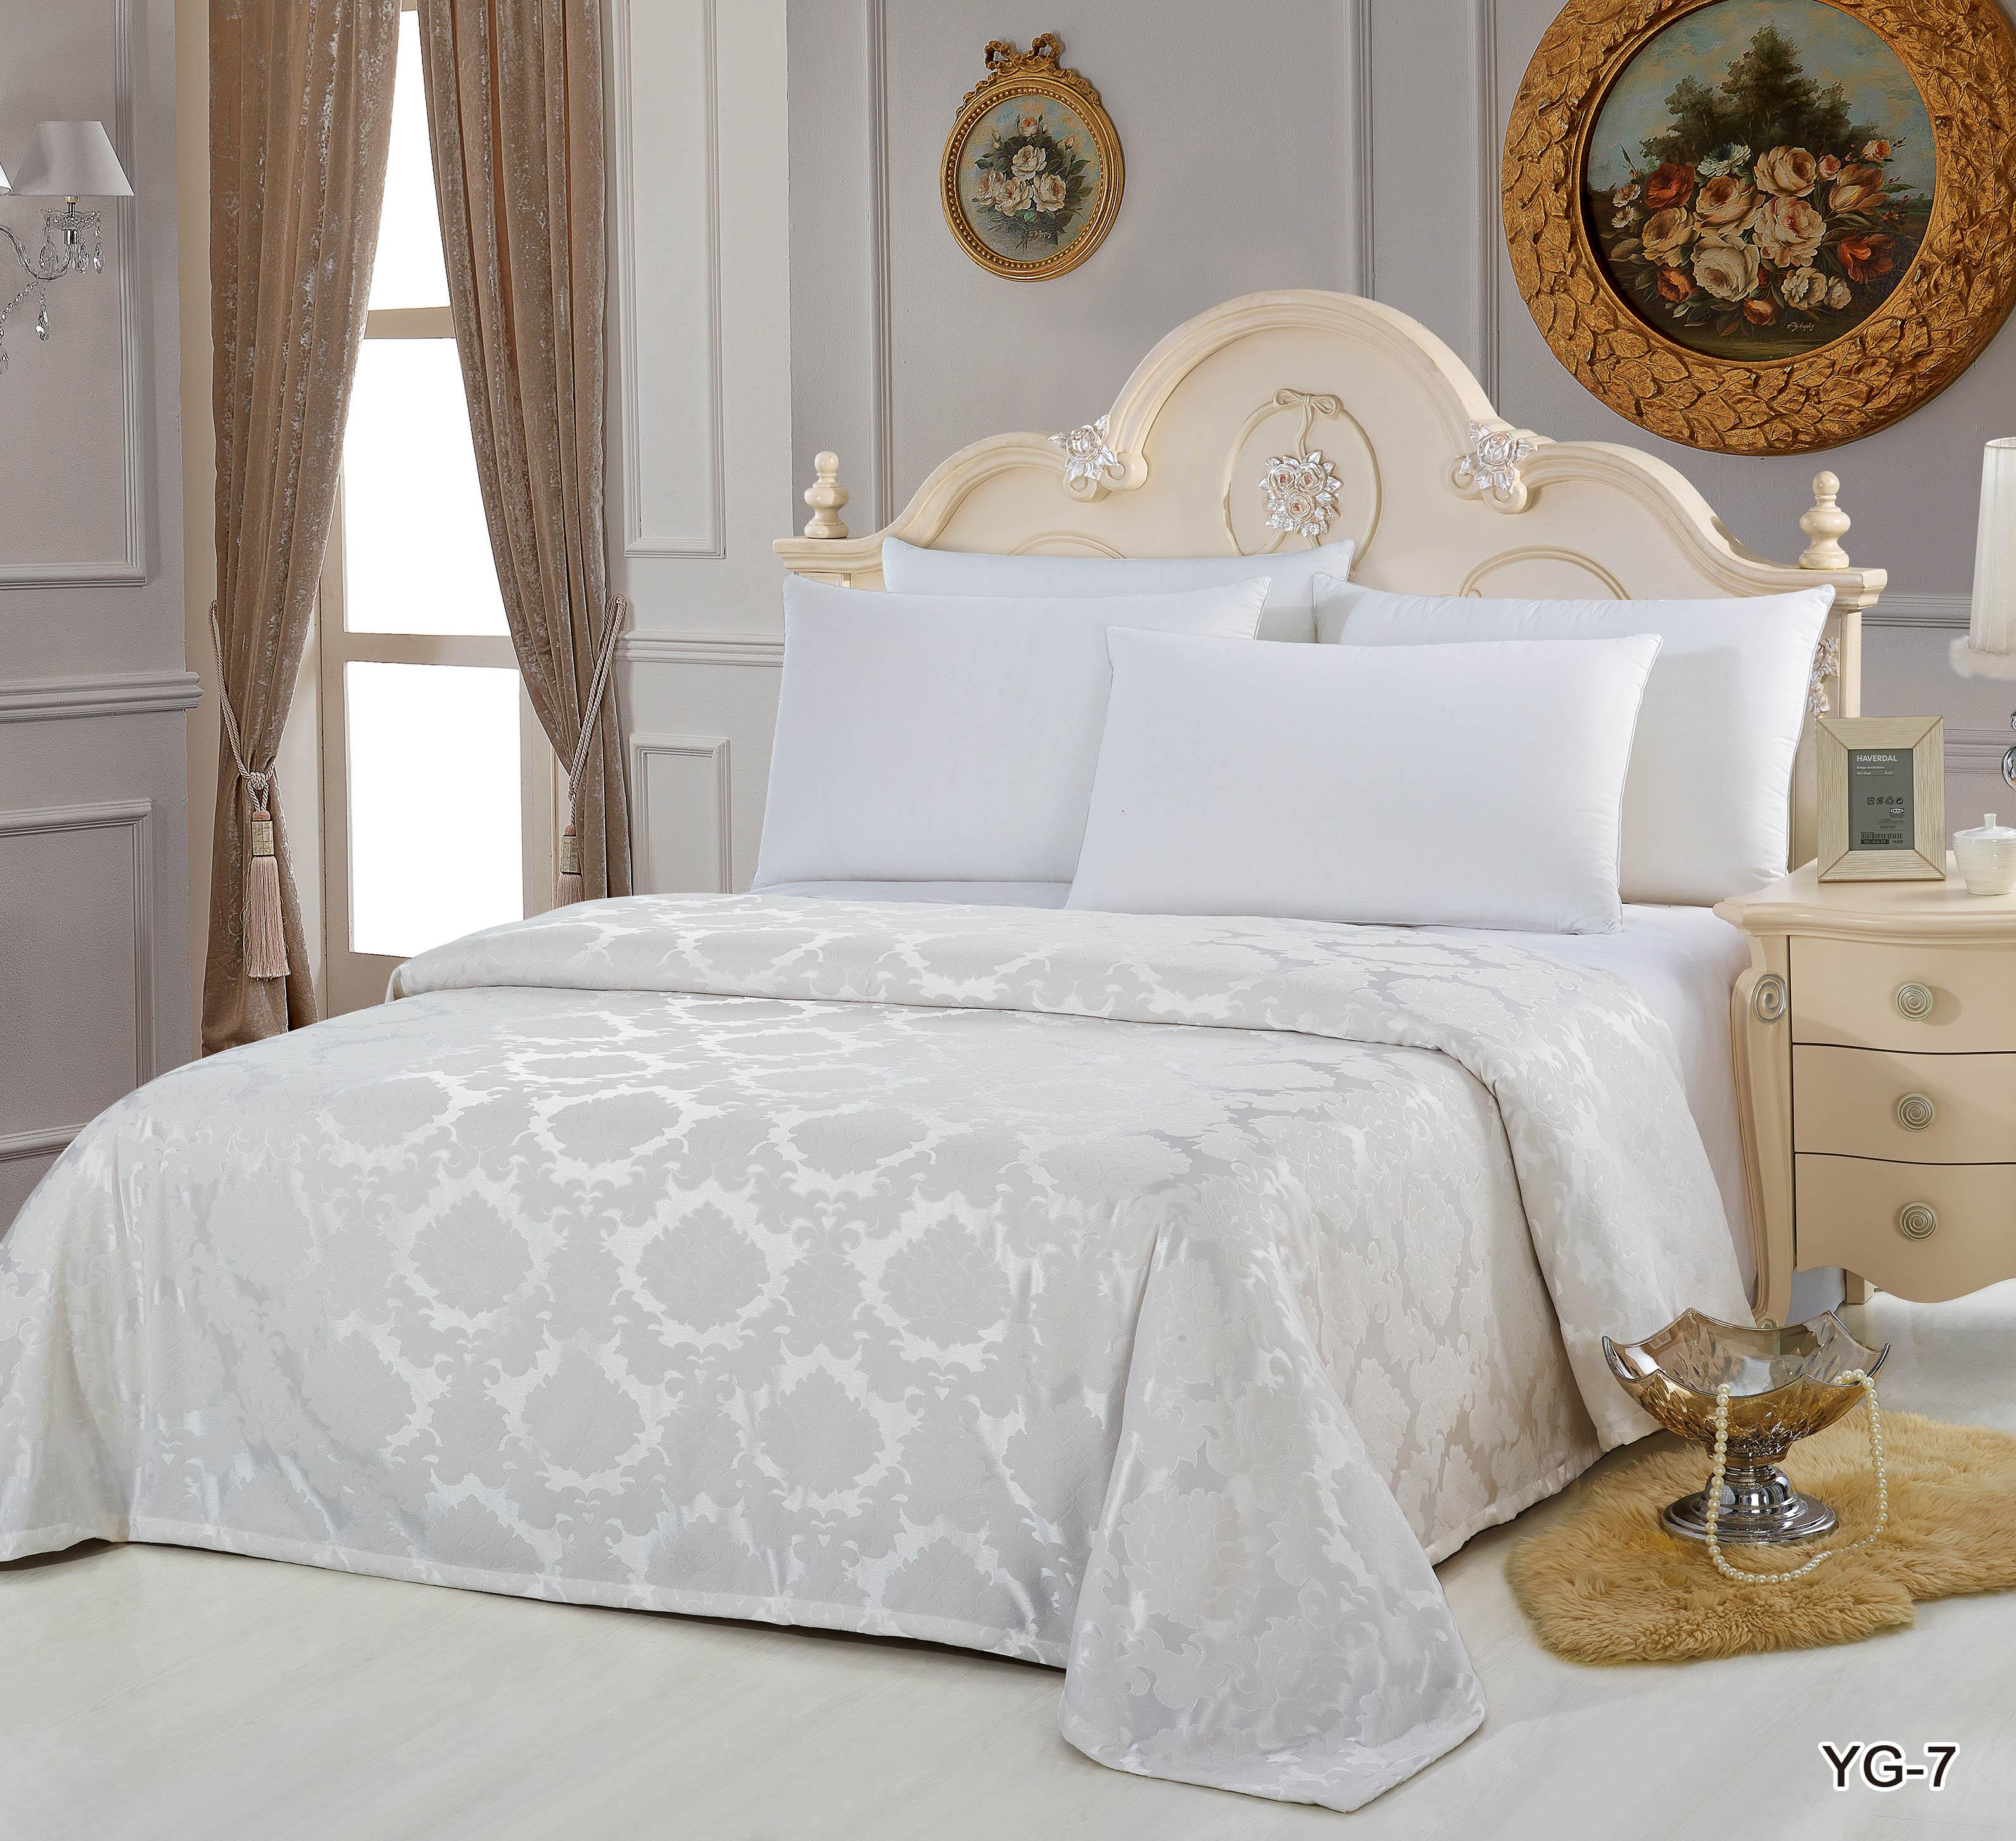 Купить Пледы и покрывала KingSilk, Покрывало Christelle (240х260 см), Китай, Белый, Вискозный жаккард